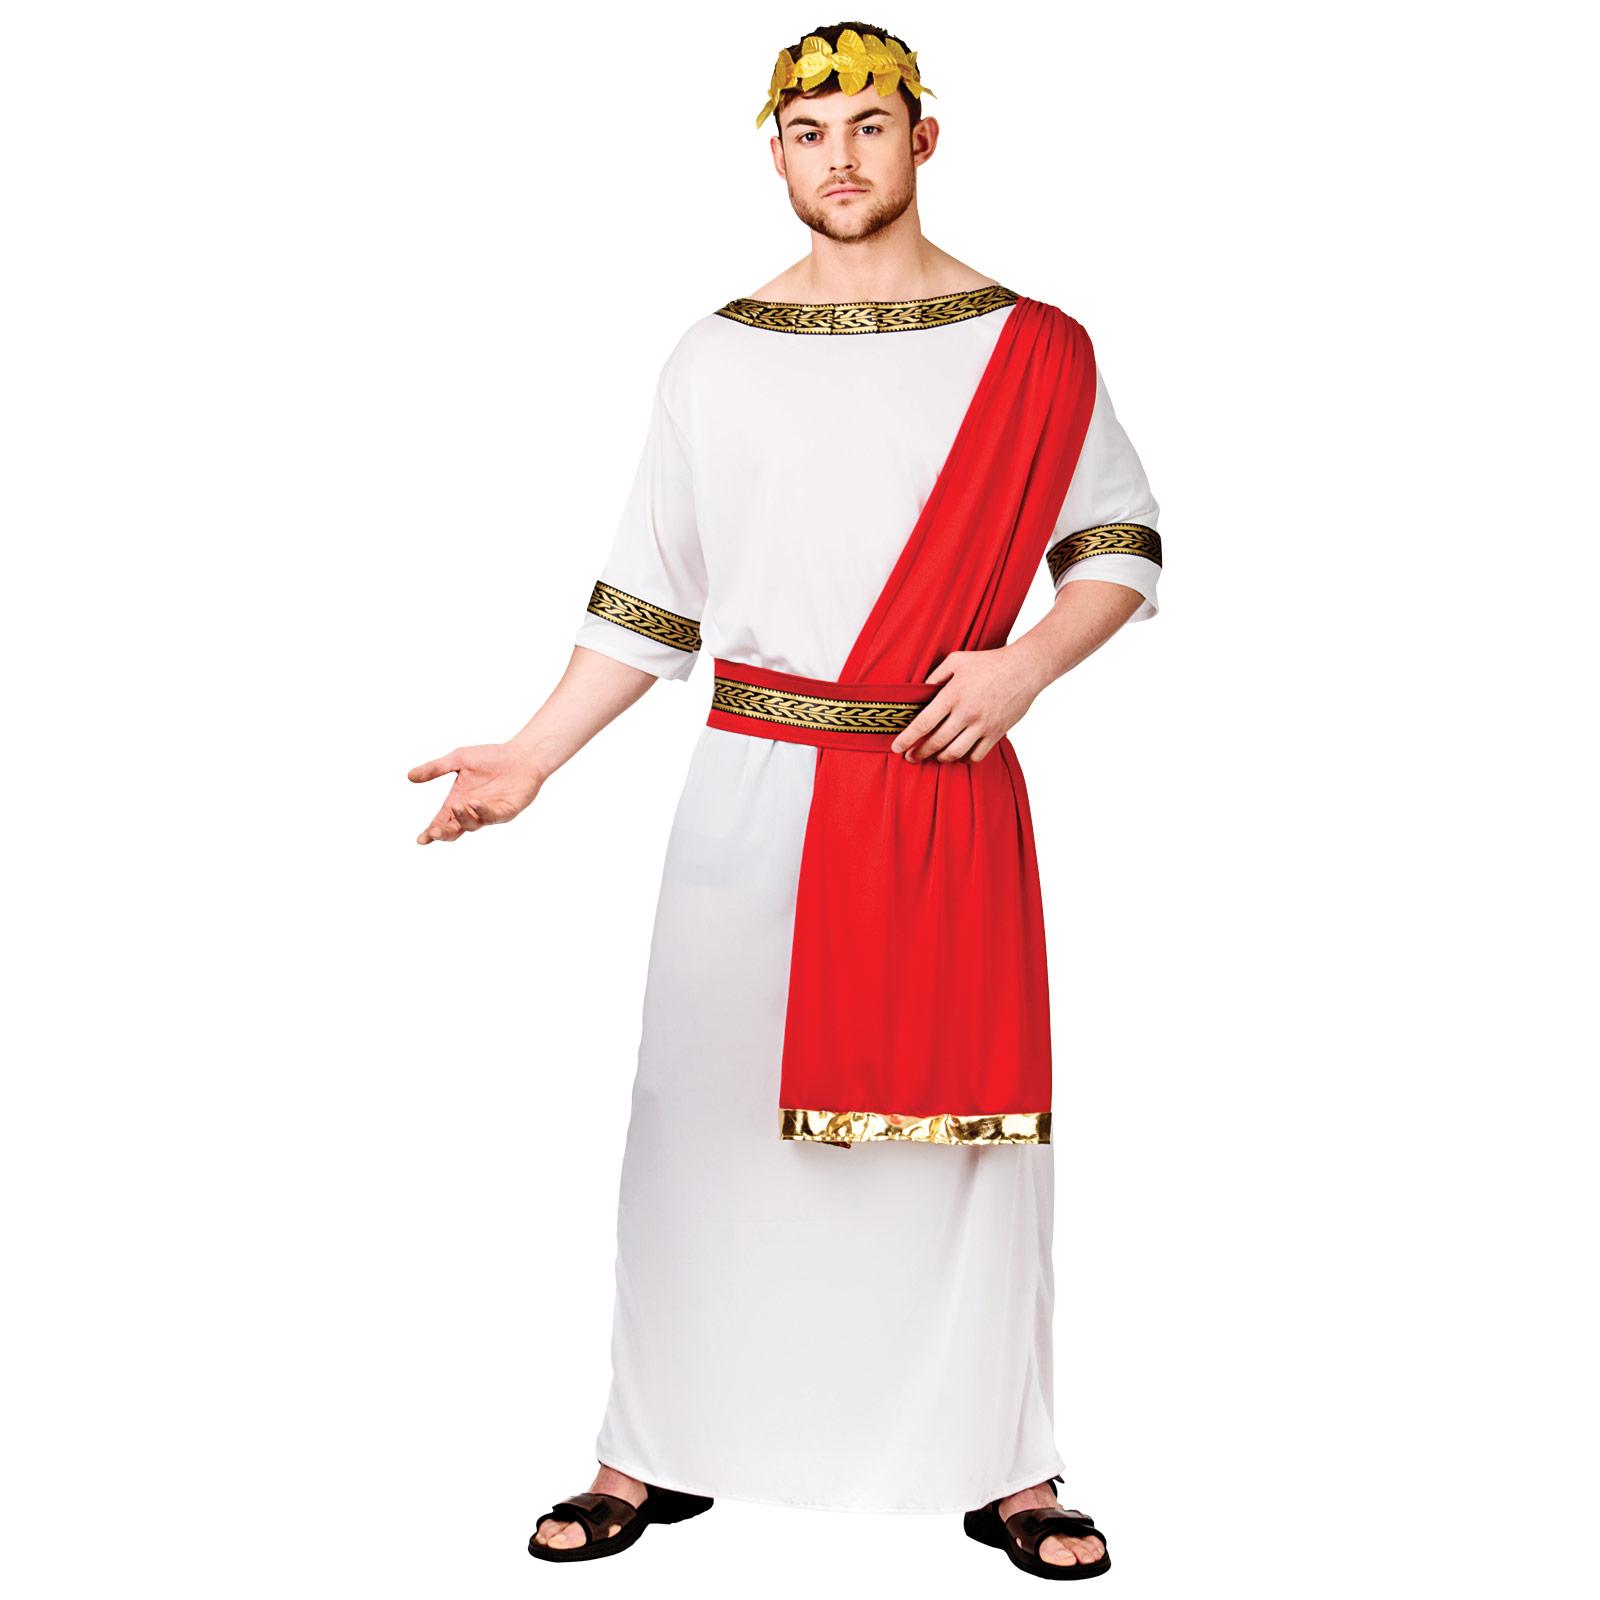 Greek And Roman Slave Boys